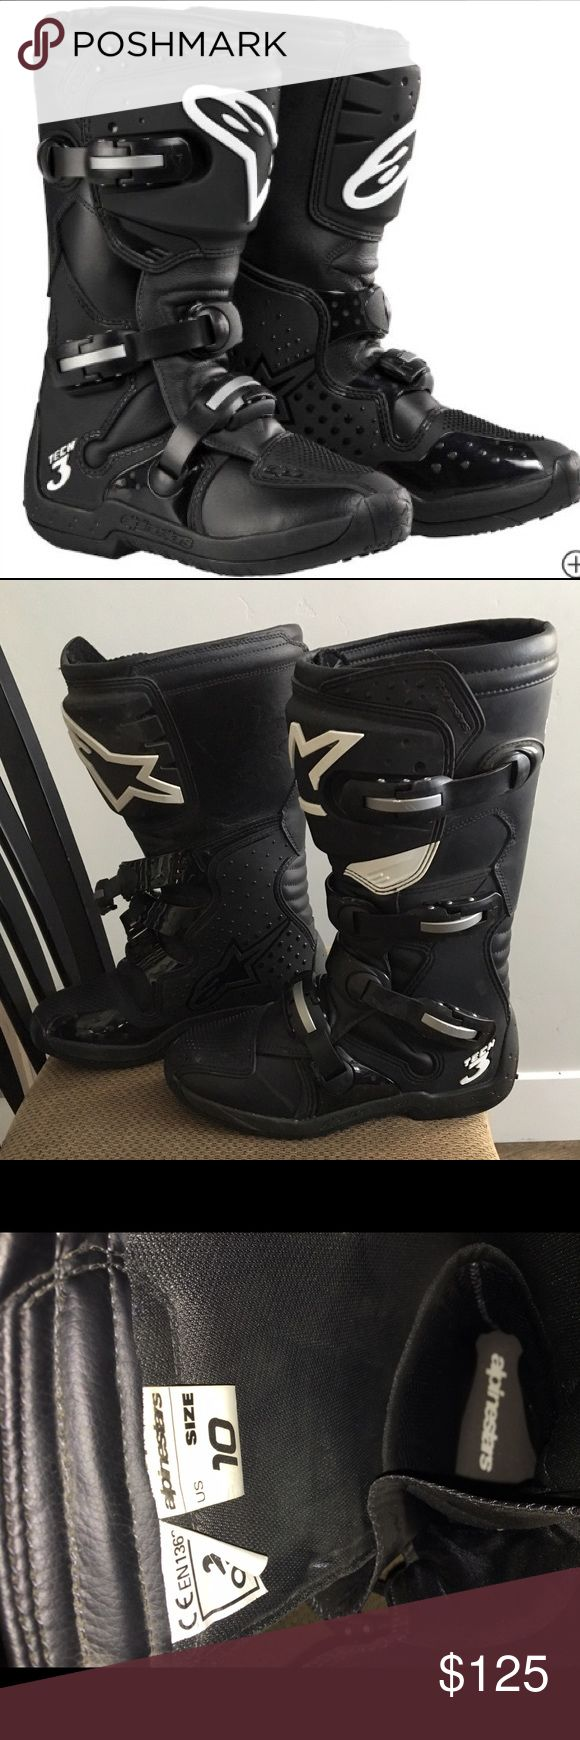 Alpinestars S Mx 5 Street Track Sport Motorcycle Boots Size 8 Black - Alpinestars motorcycle boots